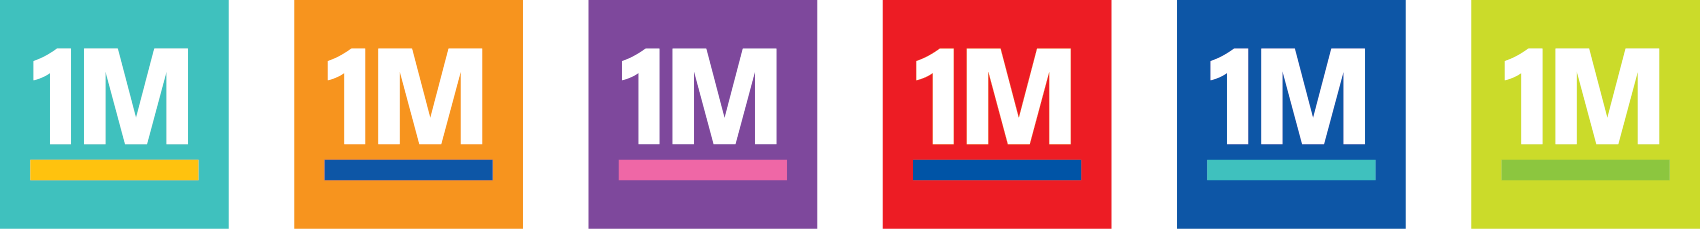 1M_LINEUP-01.jpg